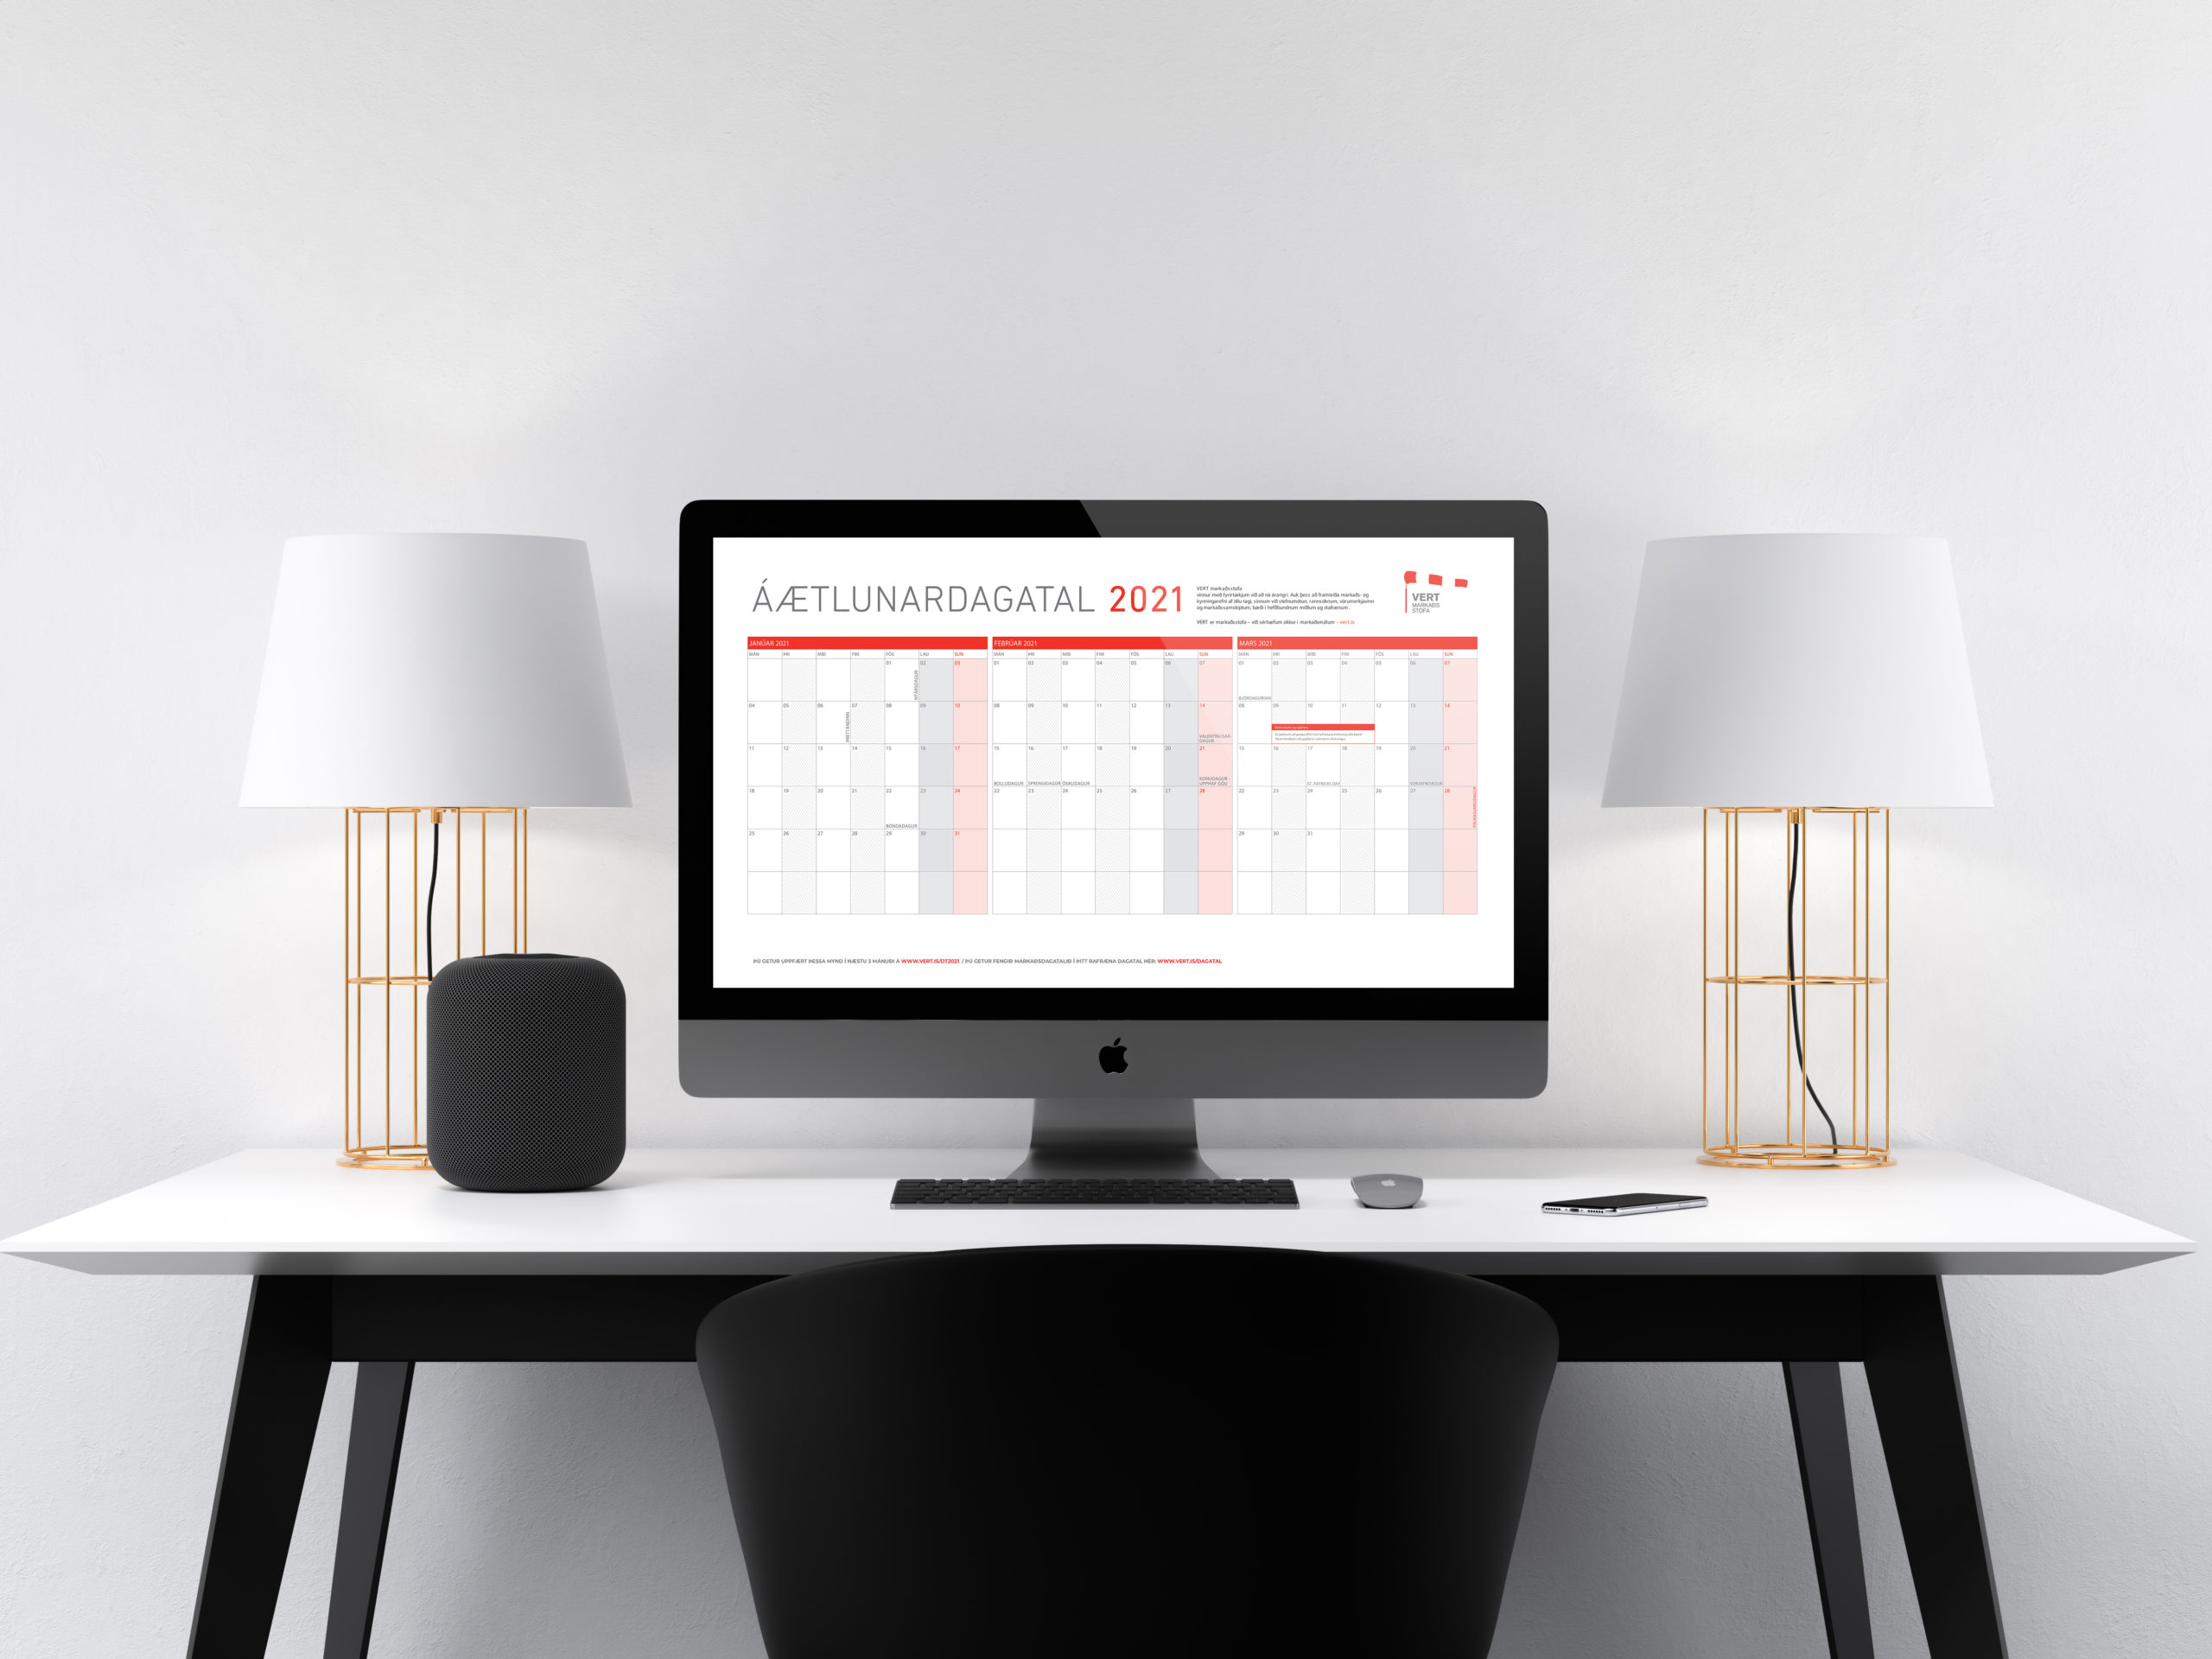 Desktop dagatal VERT